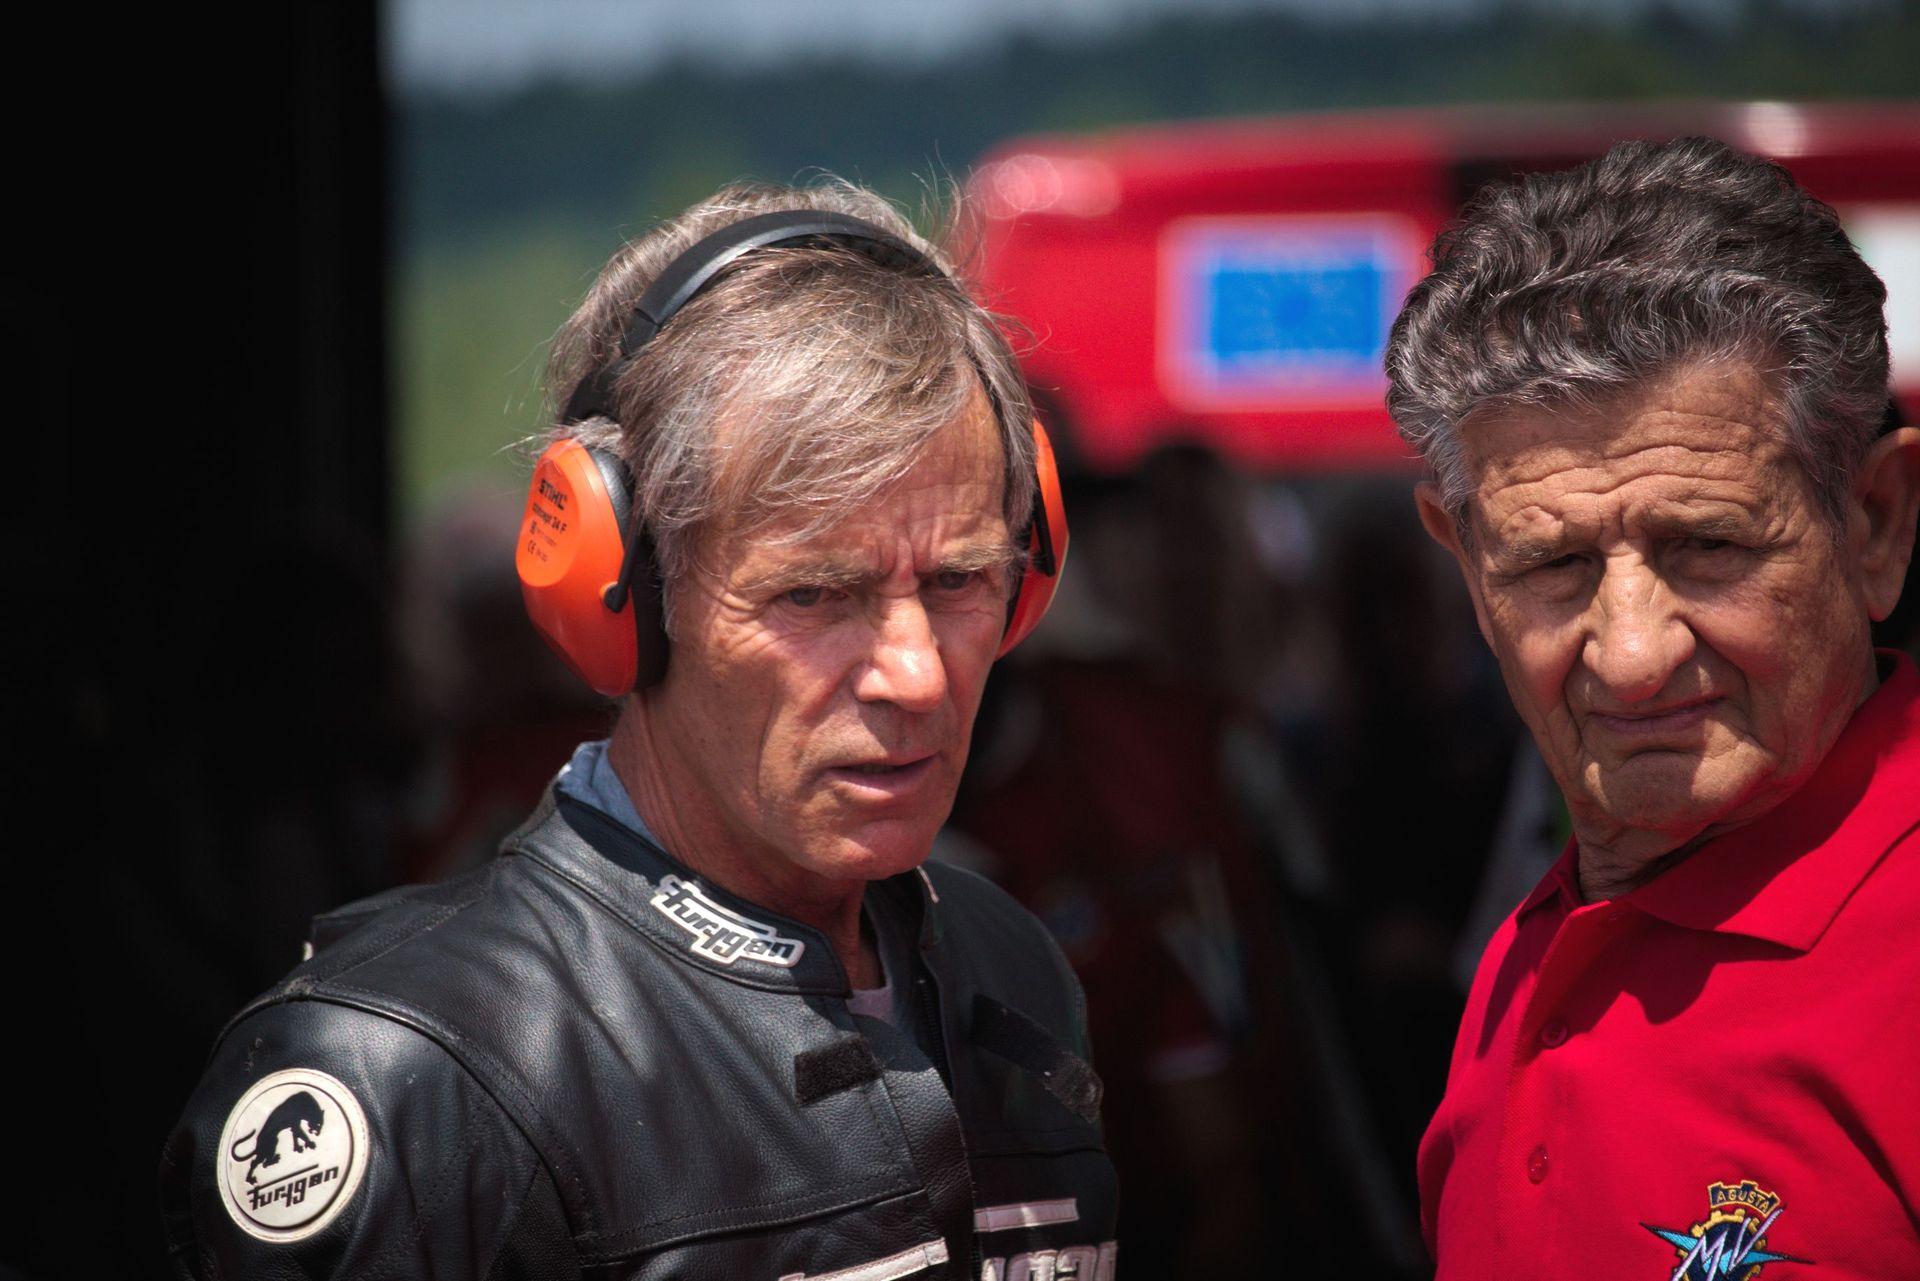 Gianfranco Bonera und Gilmo Paglini zur Sachsenring Classic 2017